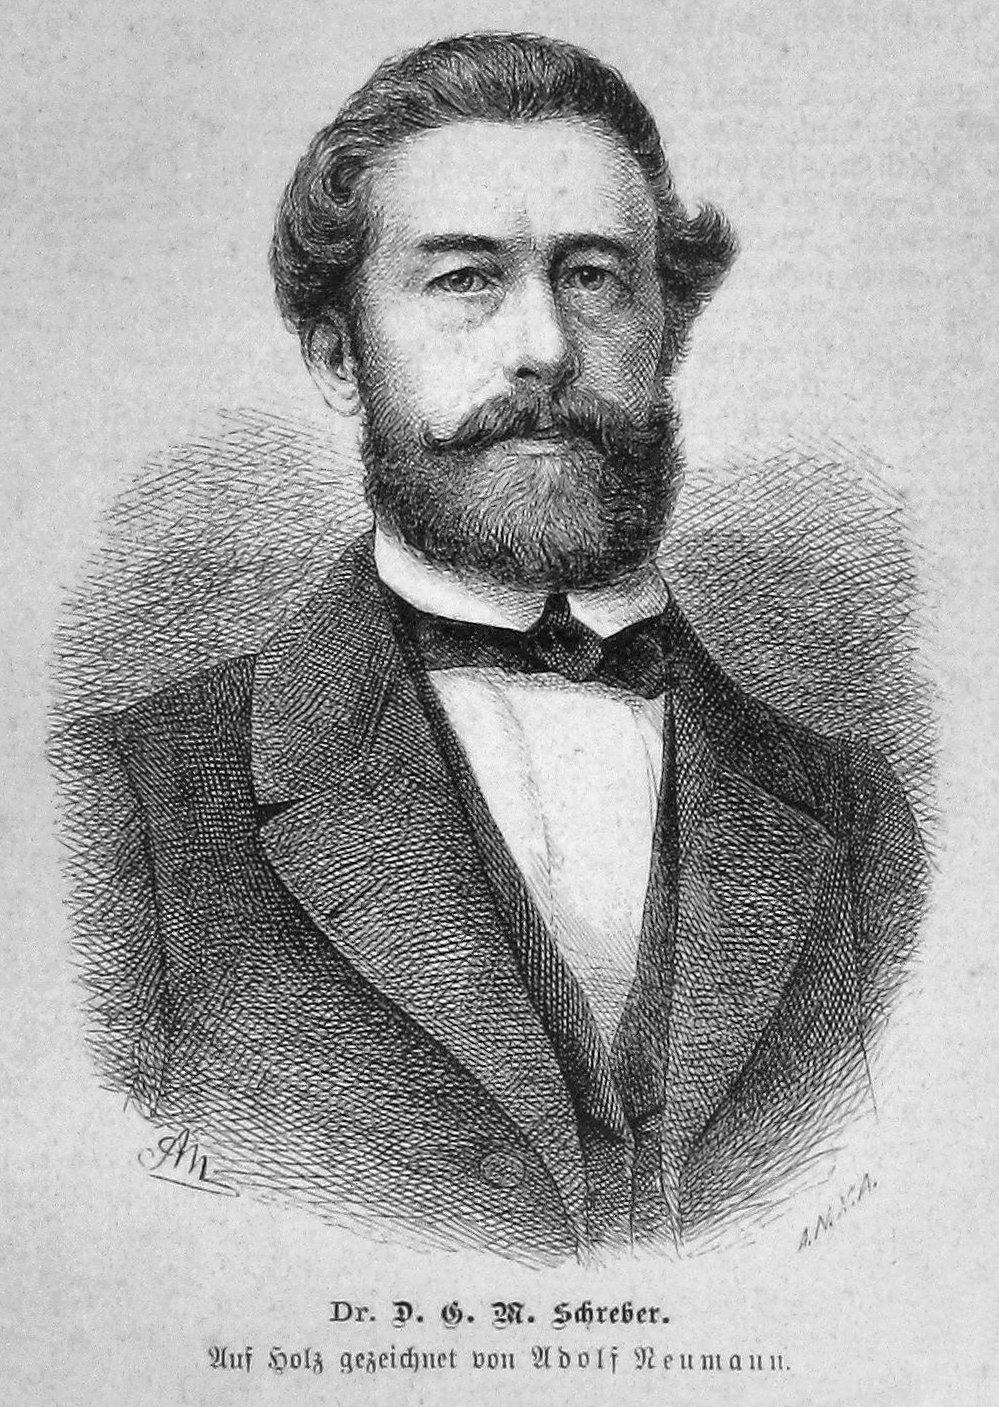 Die_Gartenlaube_(1883)_b_372